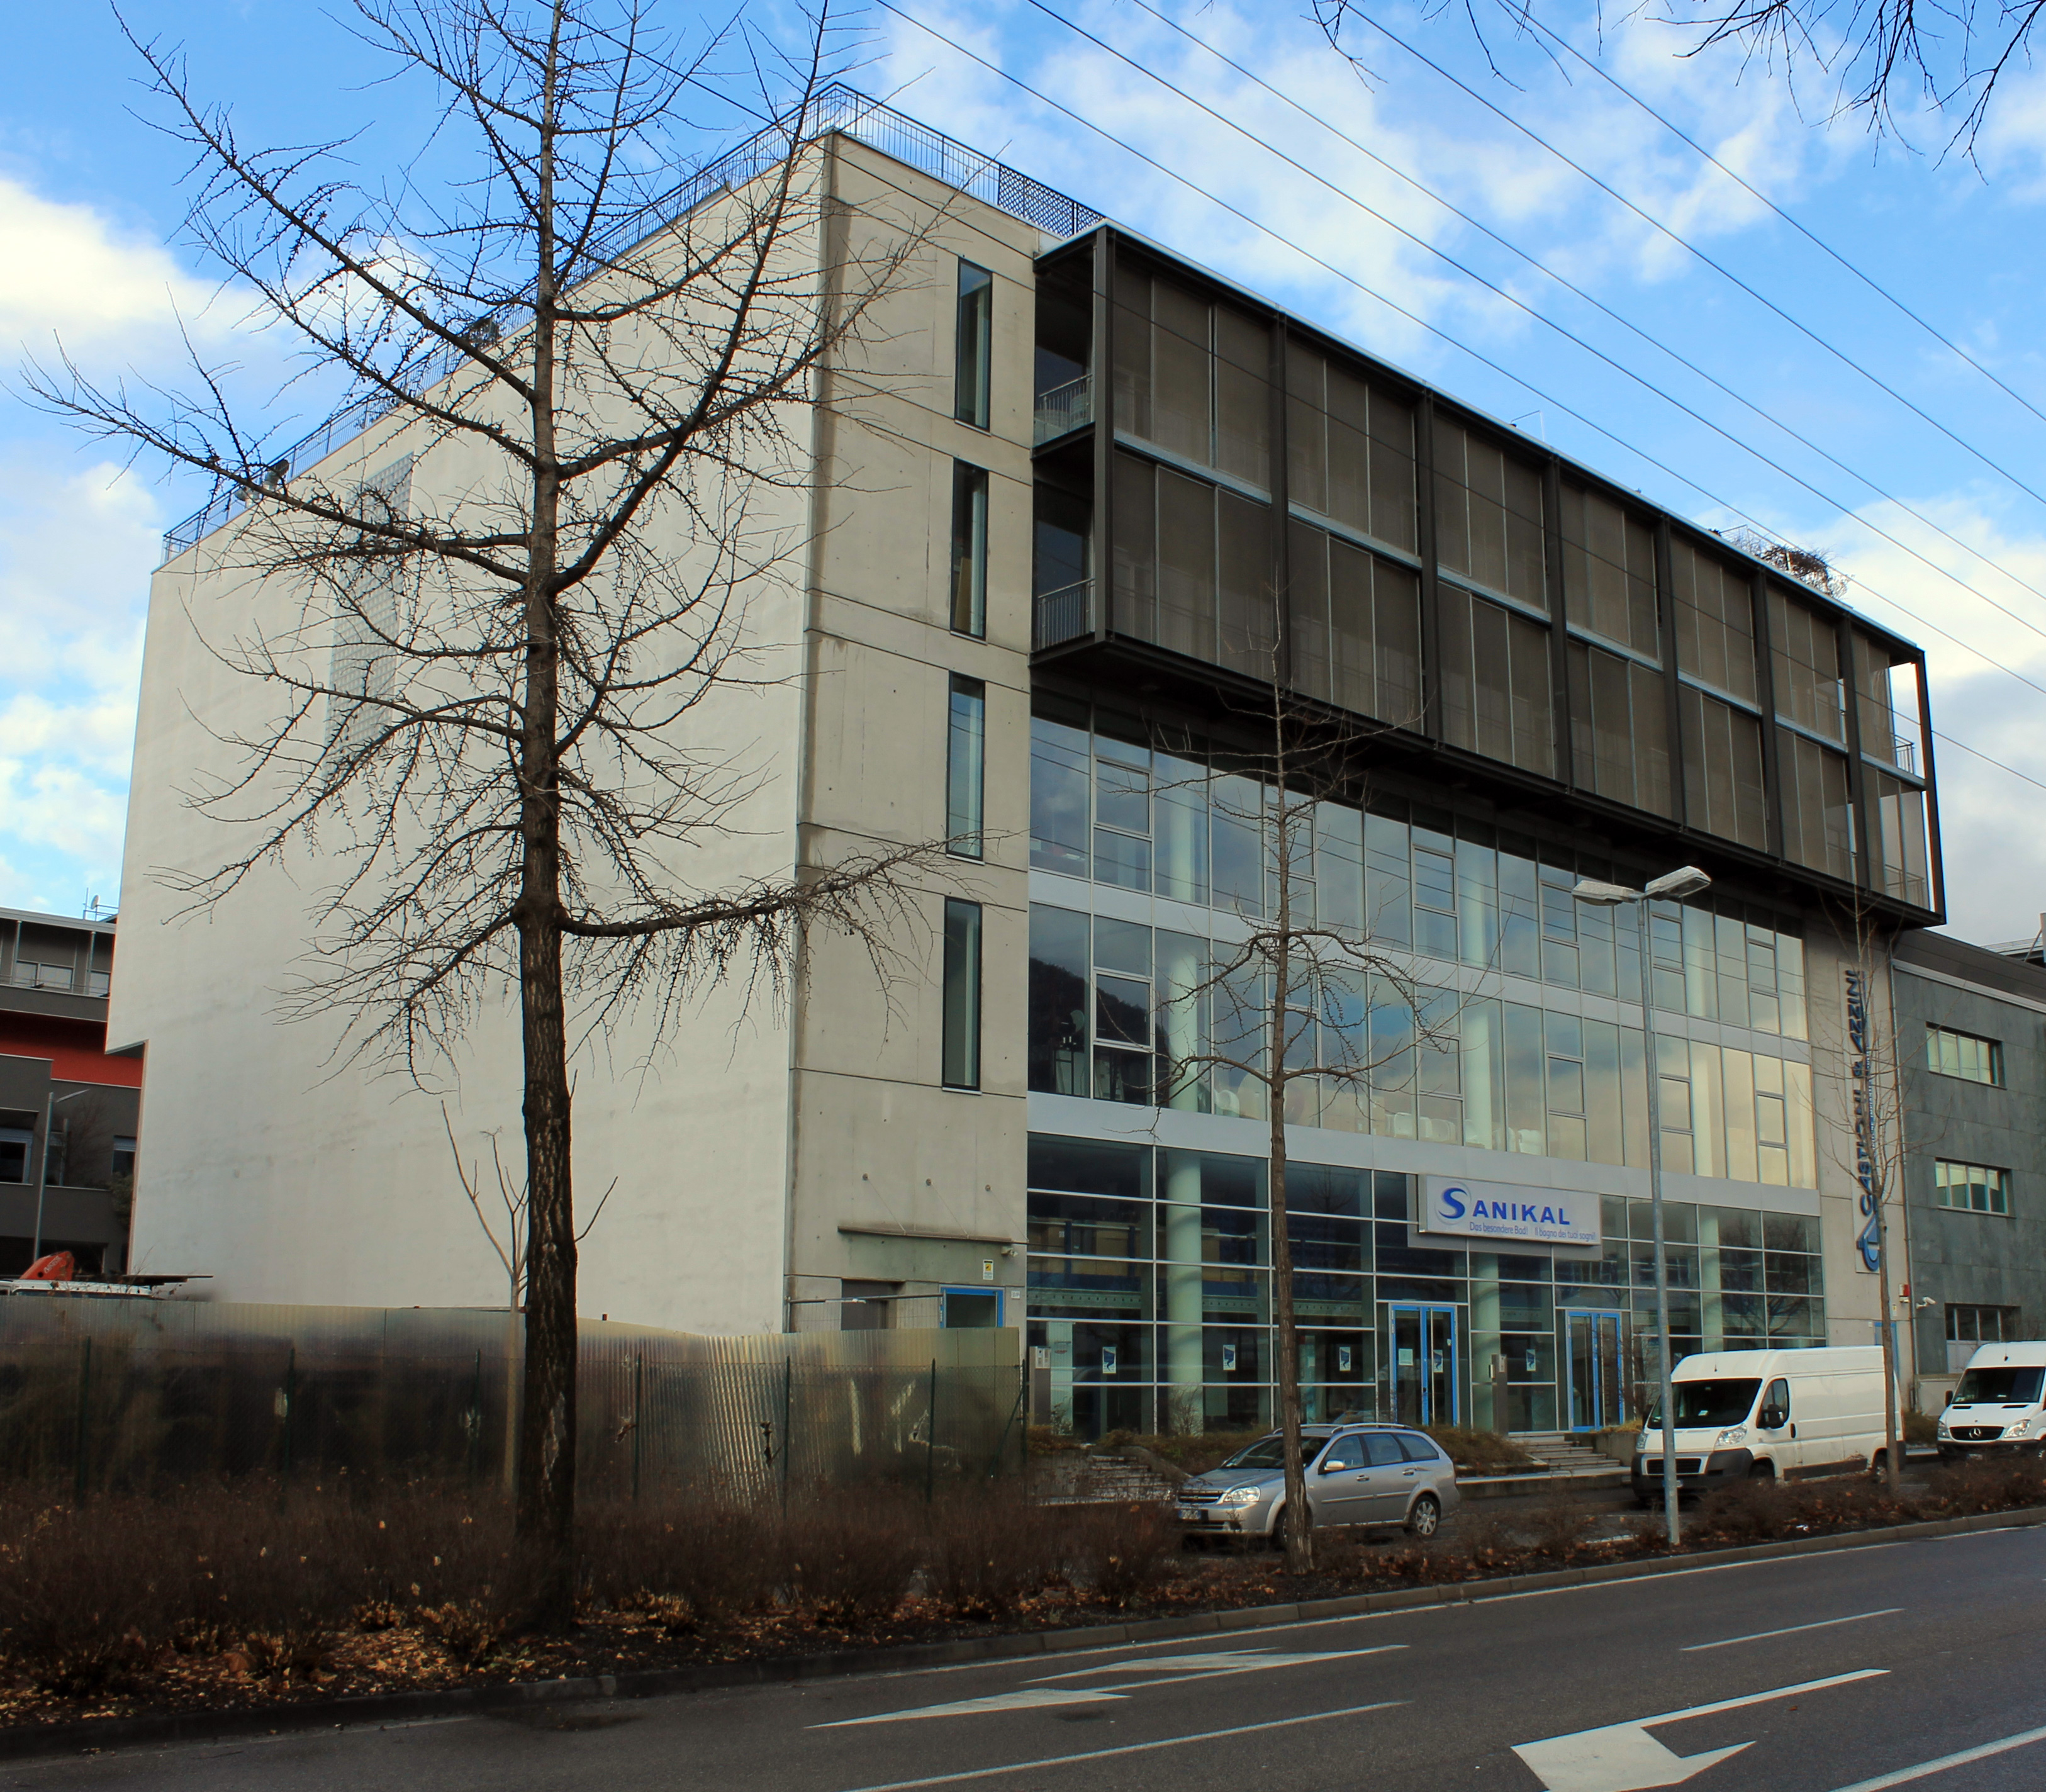 Sanikal Bozen Buozzi Strasse 2P  Fermistrasse 6A